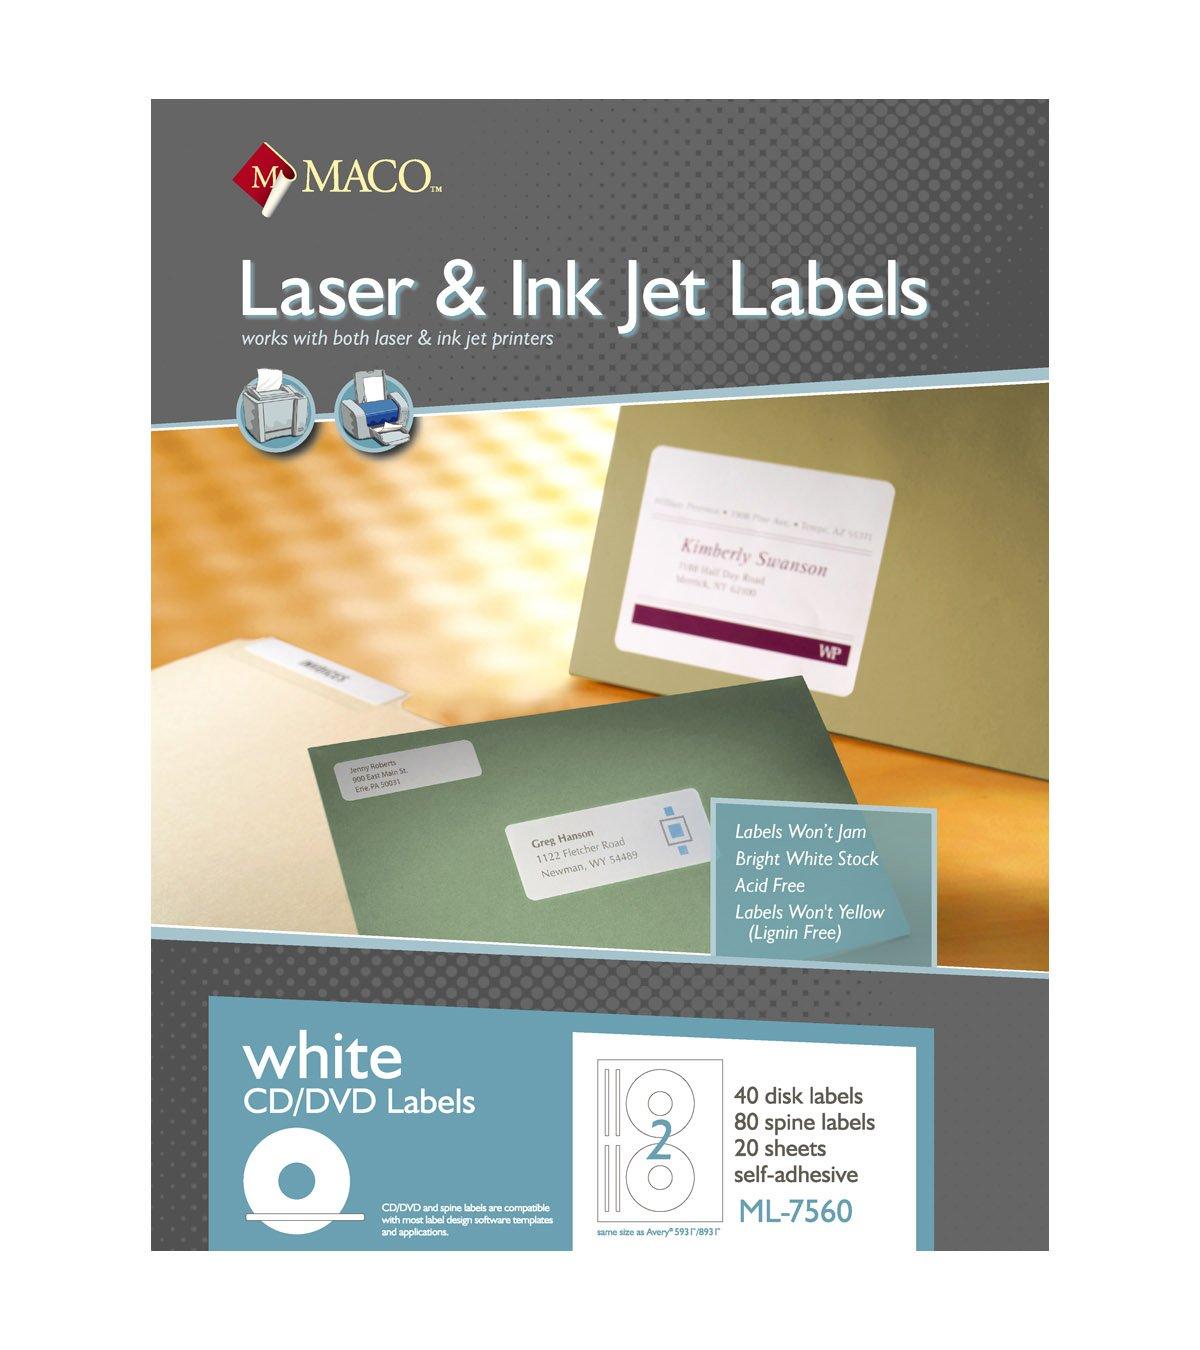 Amazon.com: MACO Laser/ink Jet Blanco CD/DVD Labels, Face y ...